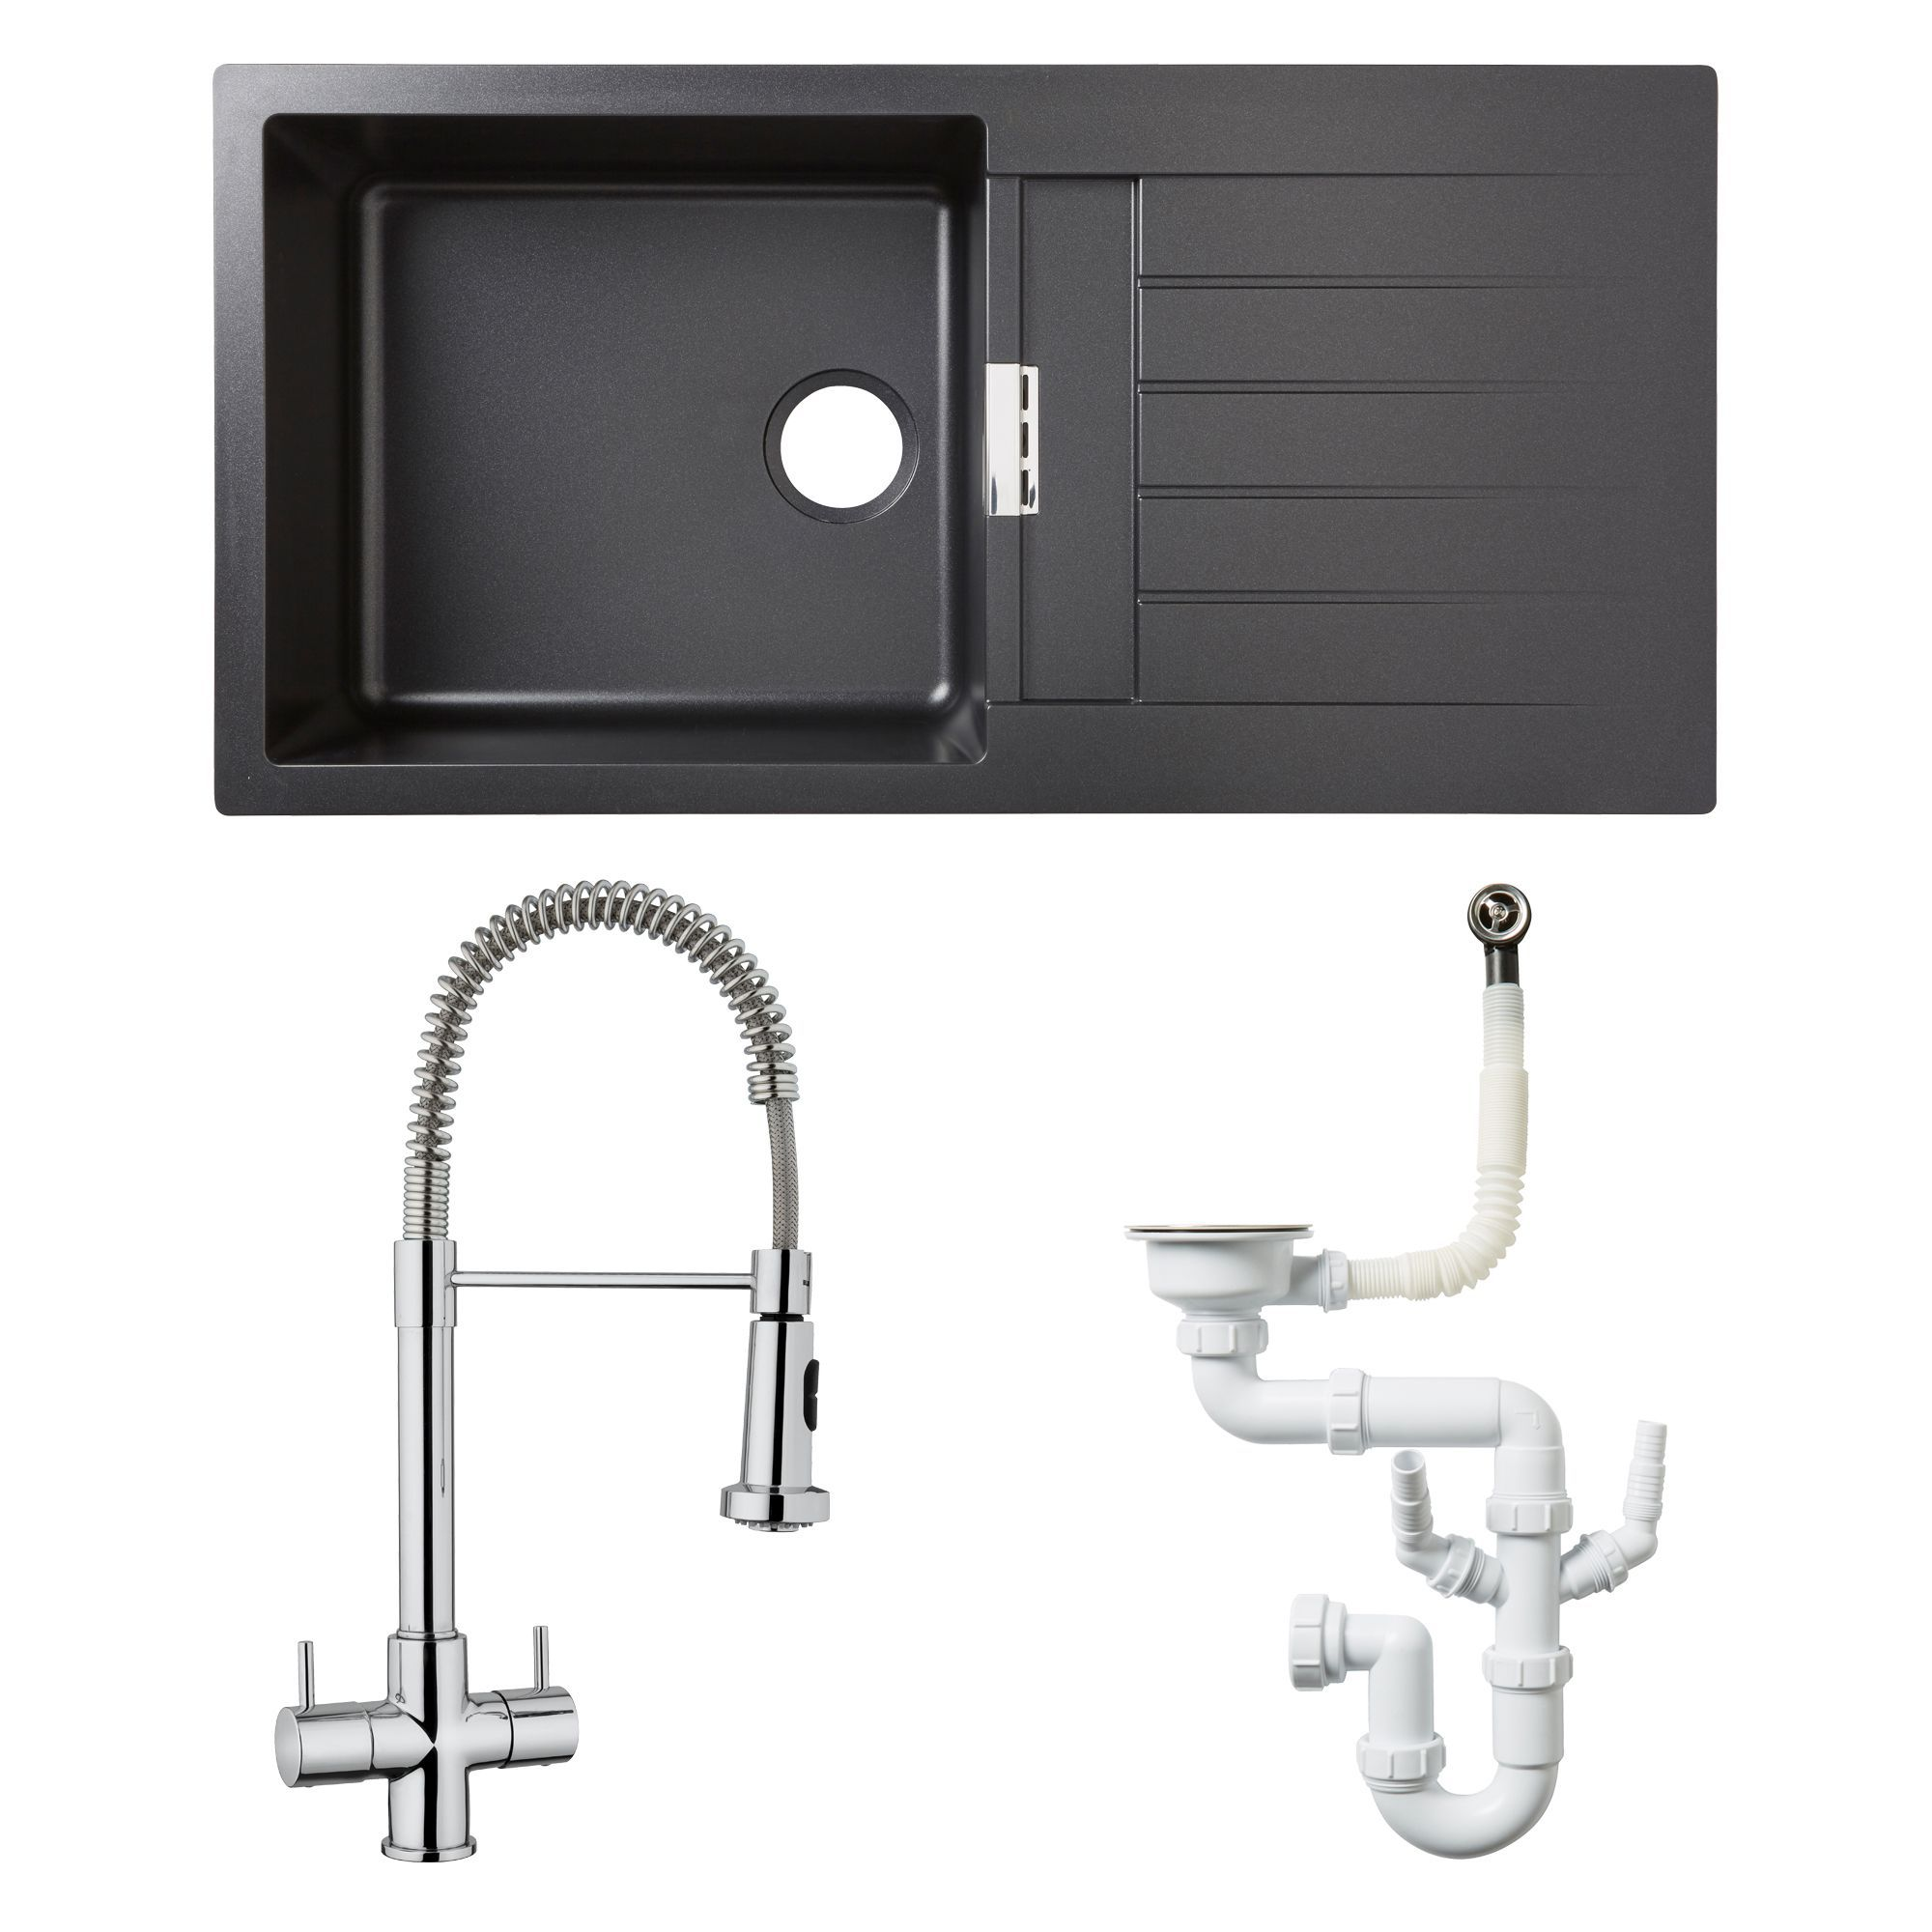 Glass Bathroom Sinks B&Q cooke & lewis 1 bowl black composite quartz sink, spring neck tap